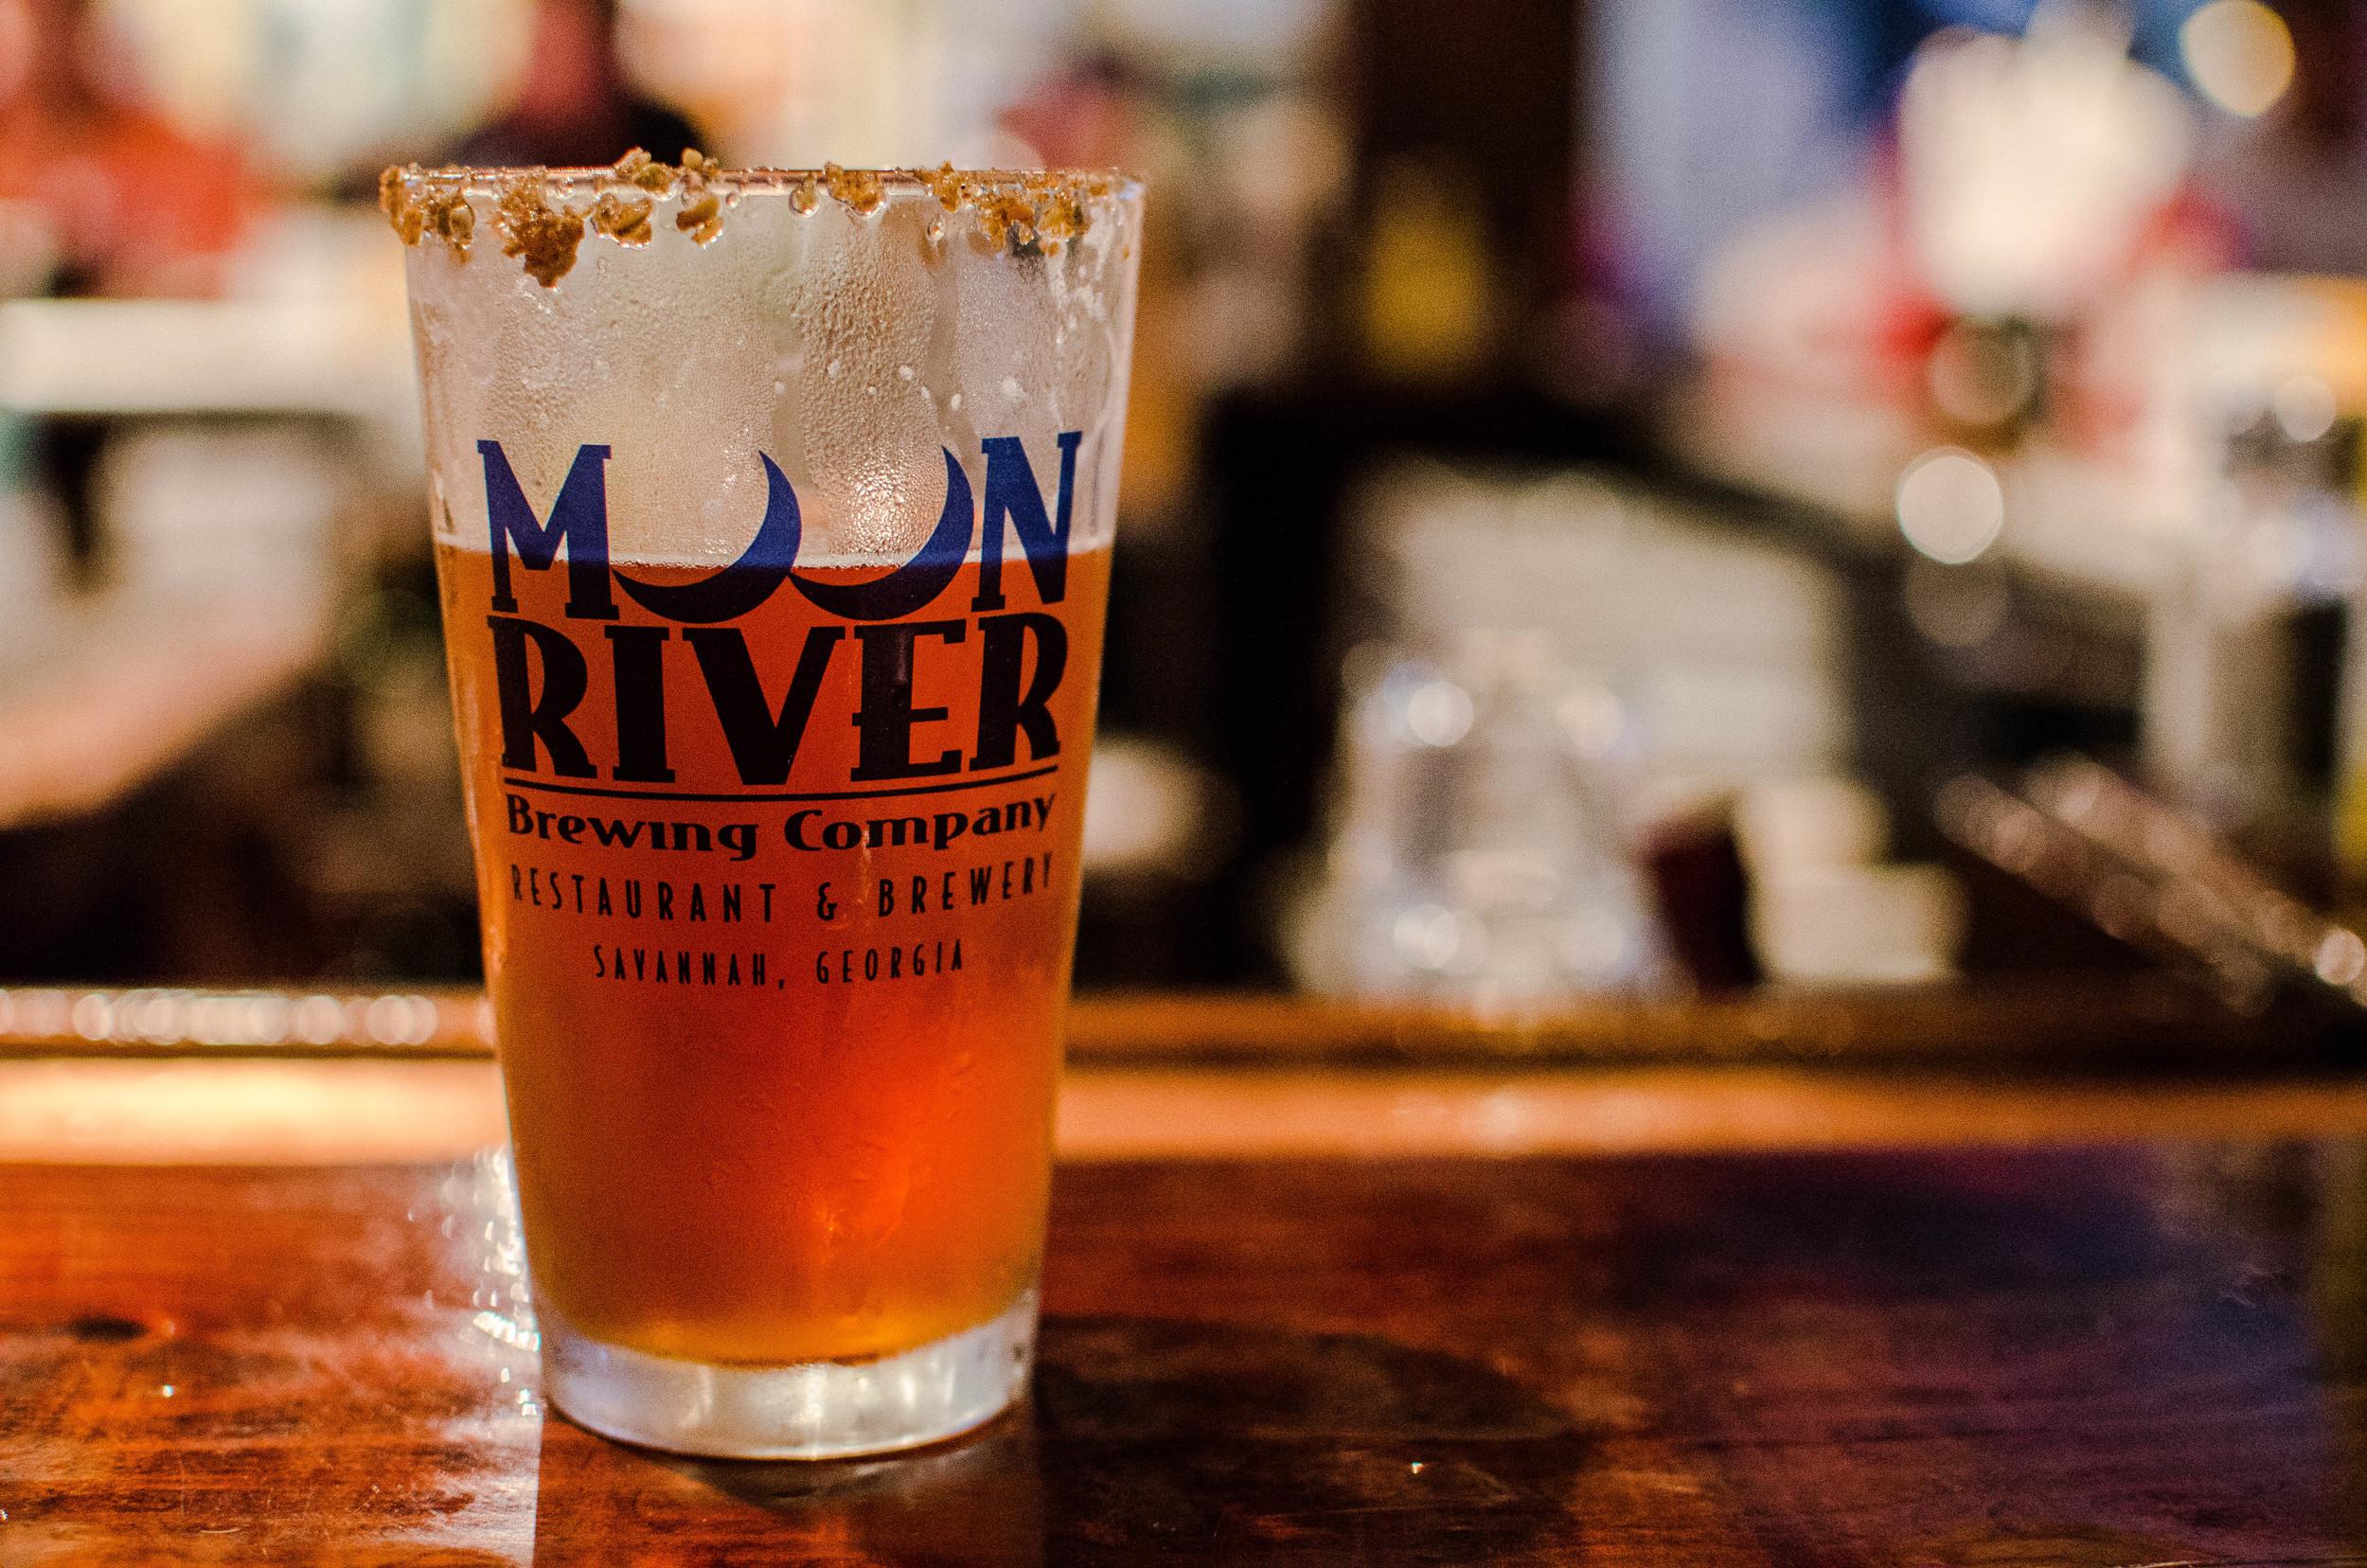 Moon River Brewing Co. - Savannah, GA